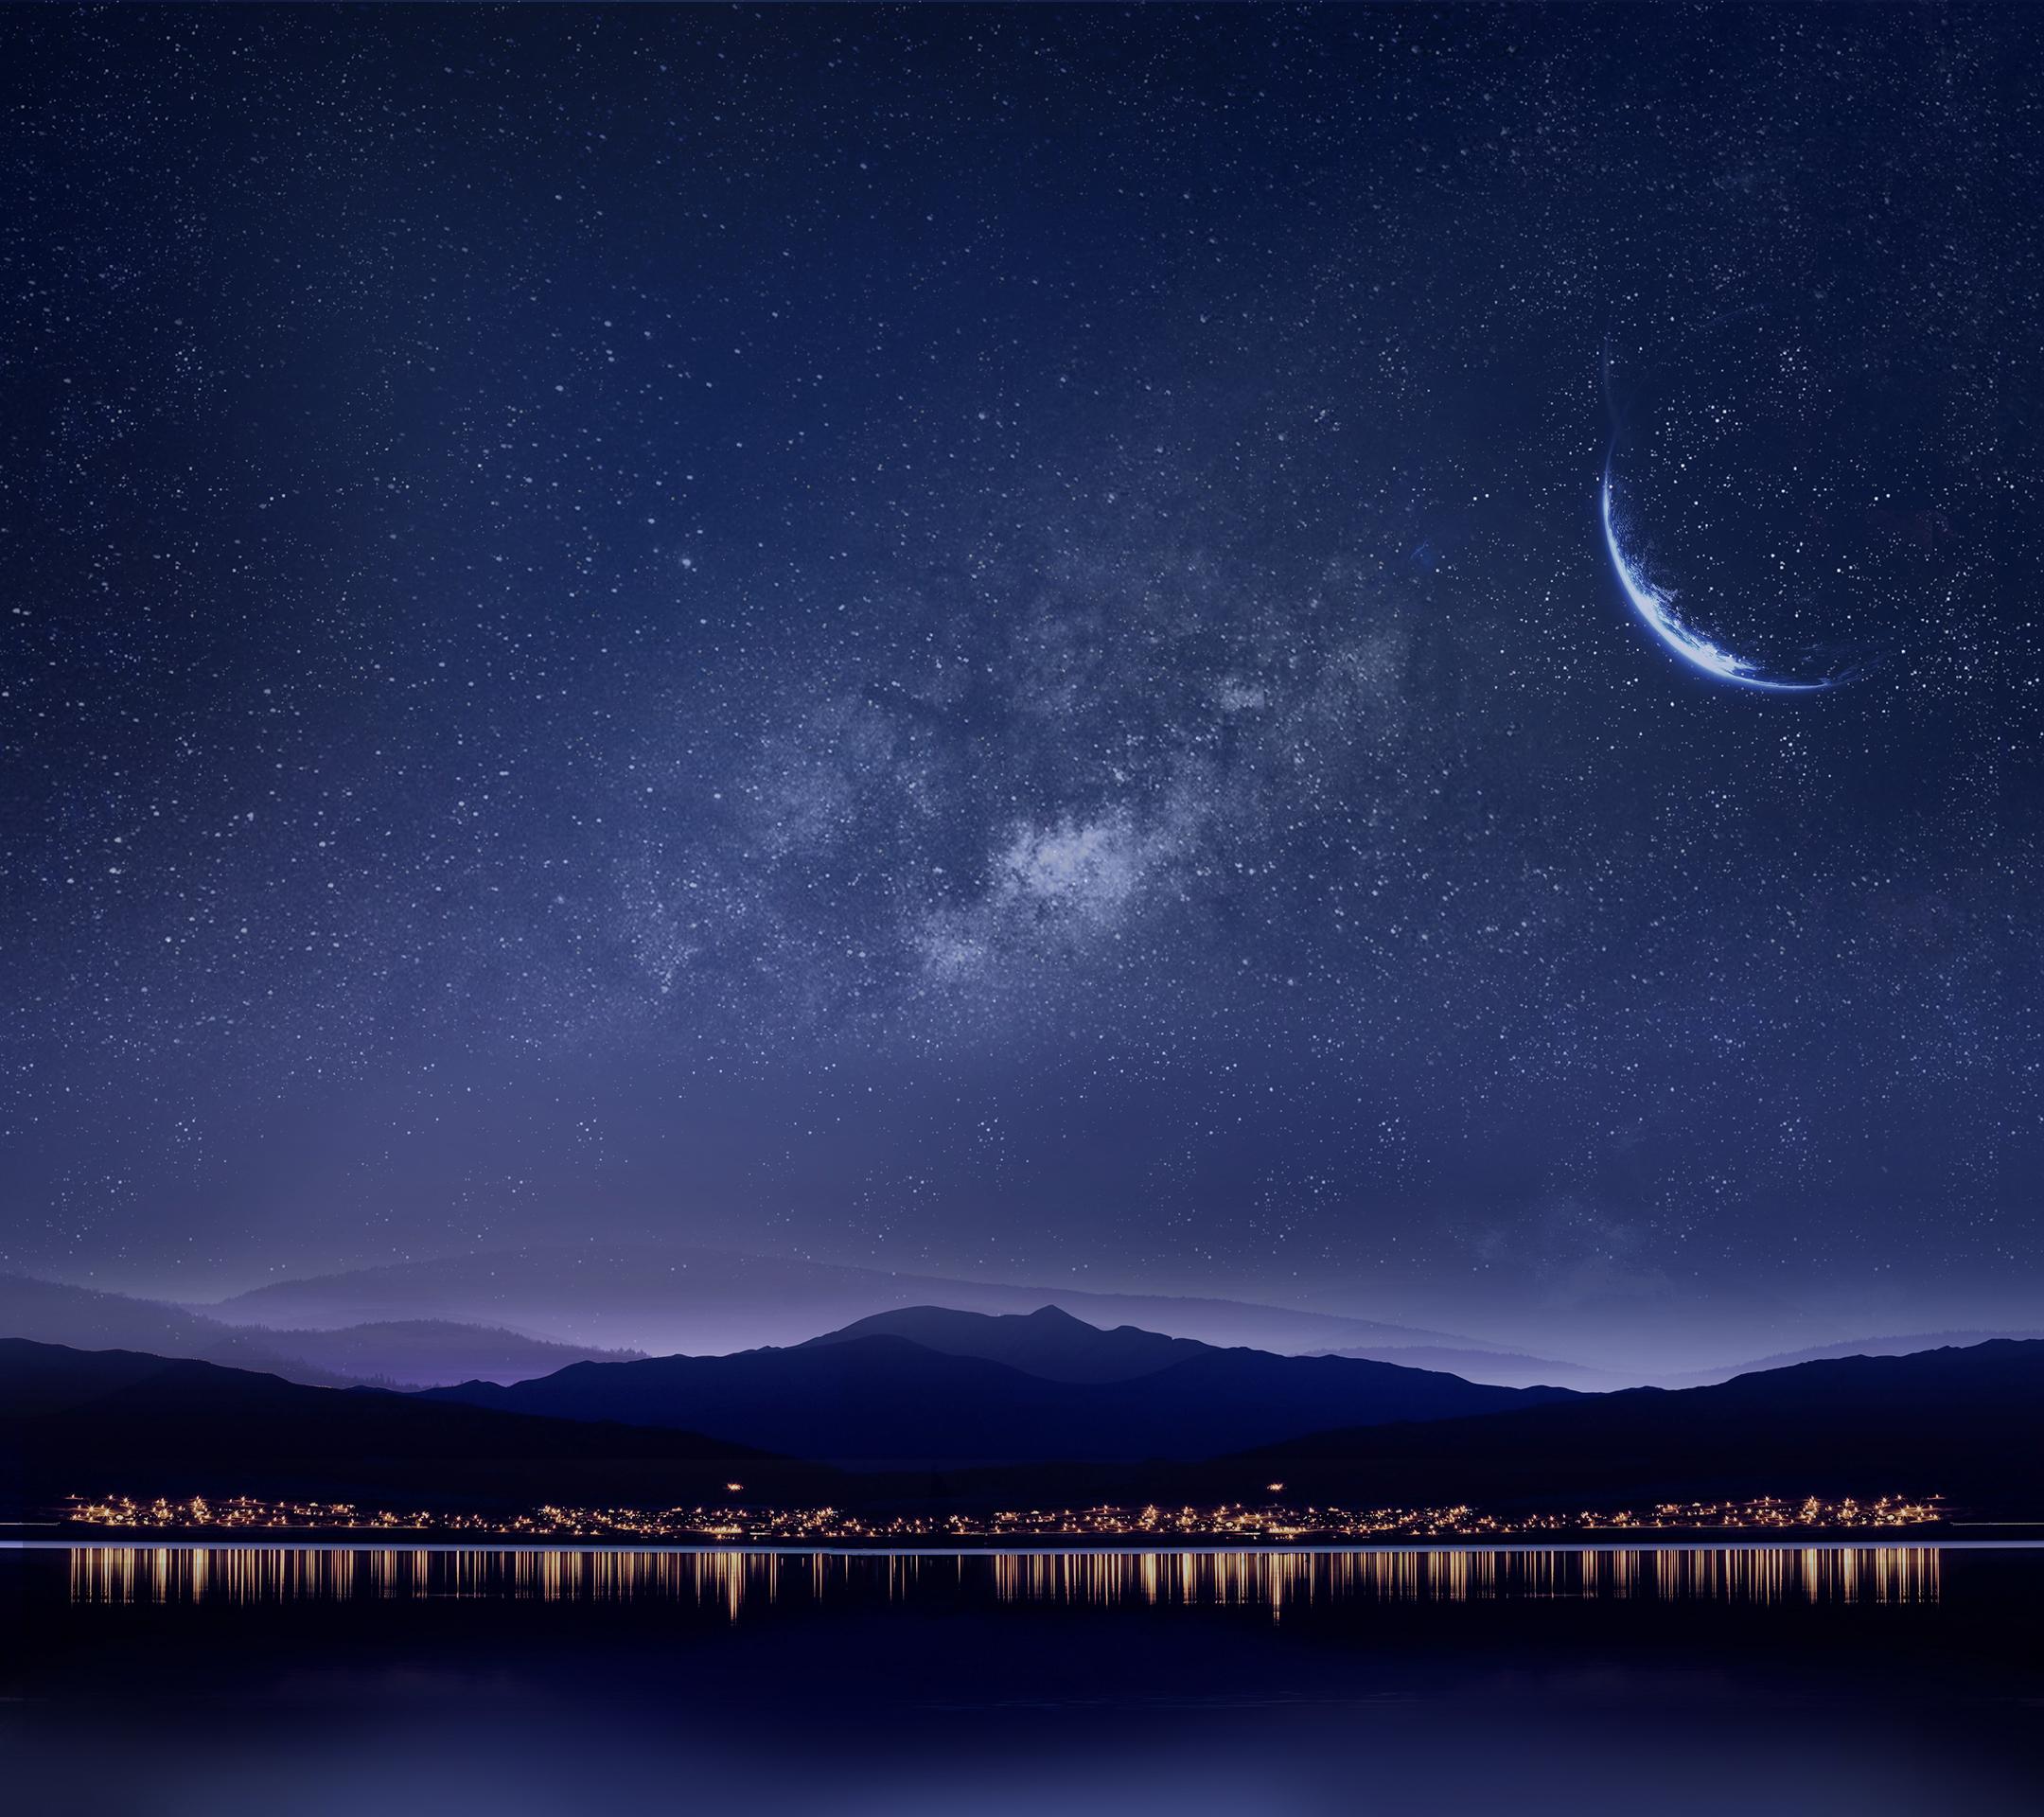 Картинка луны и звезды